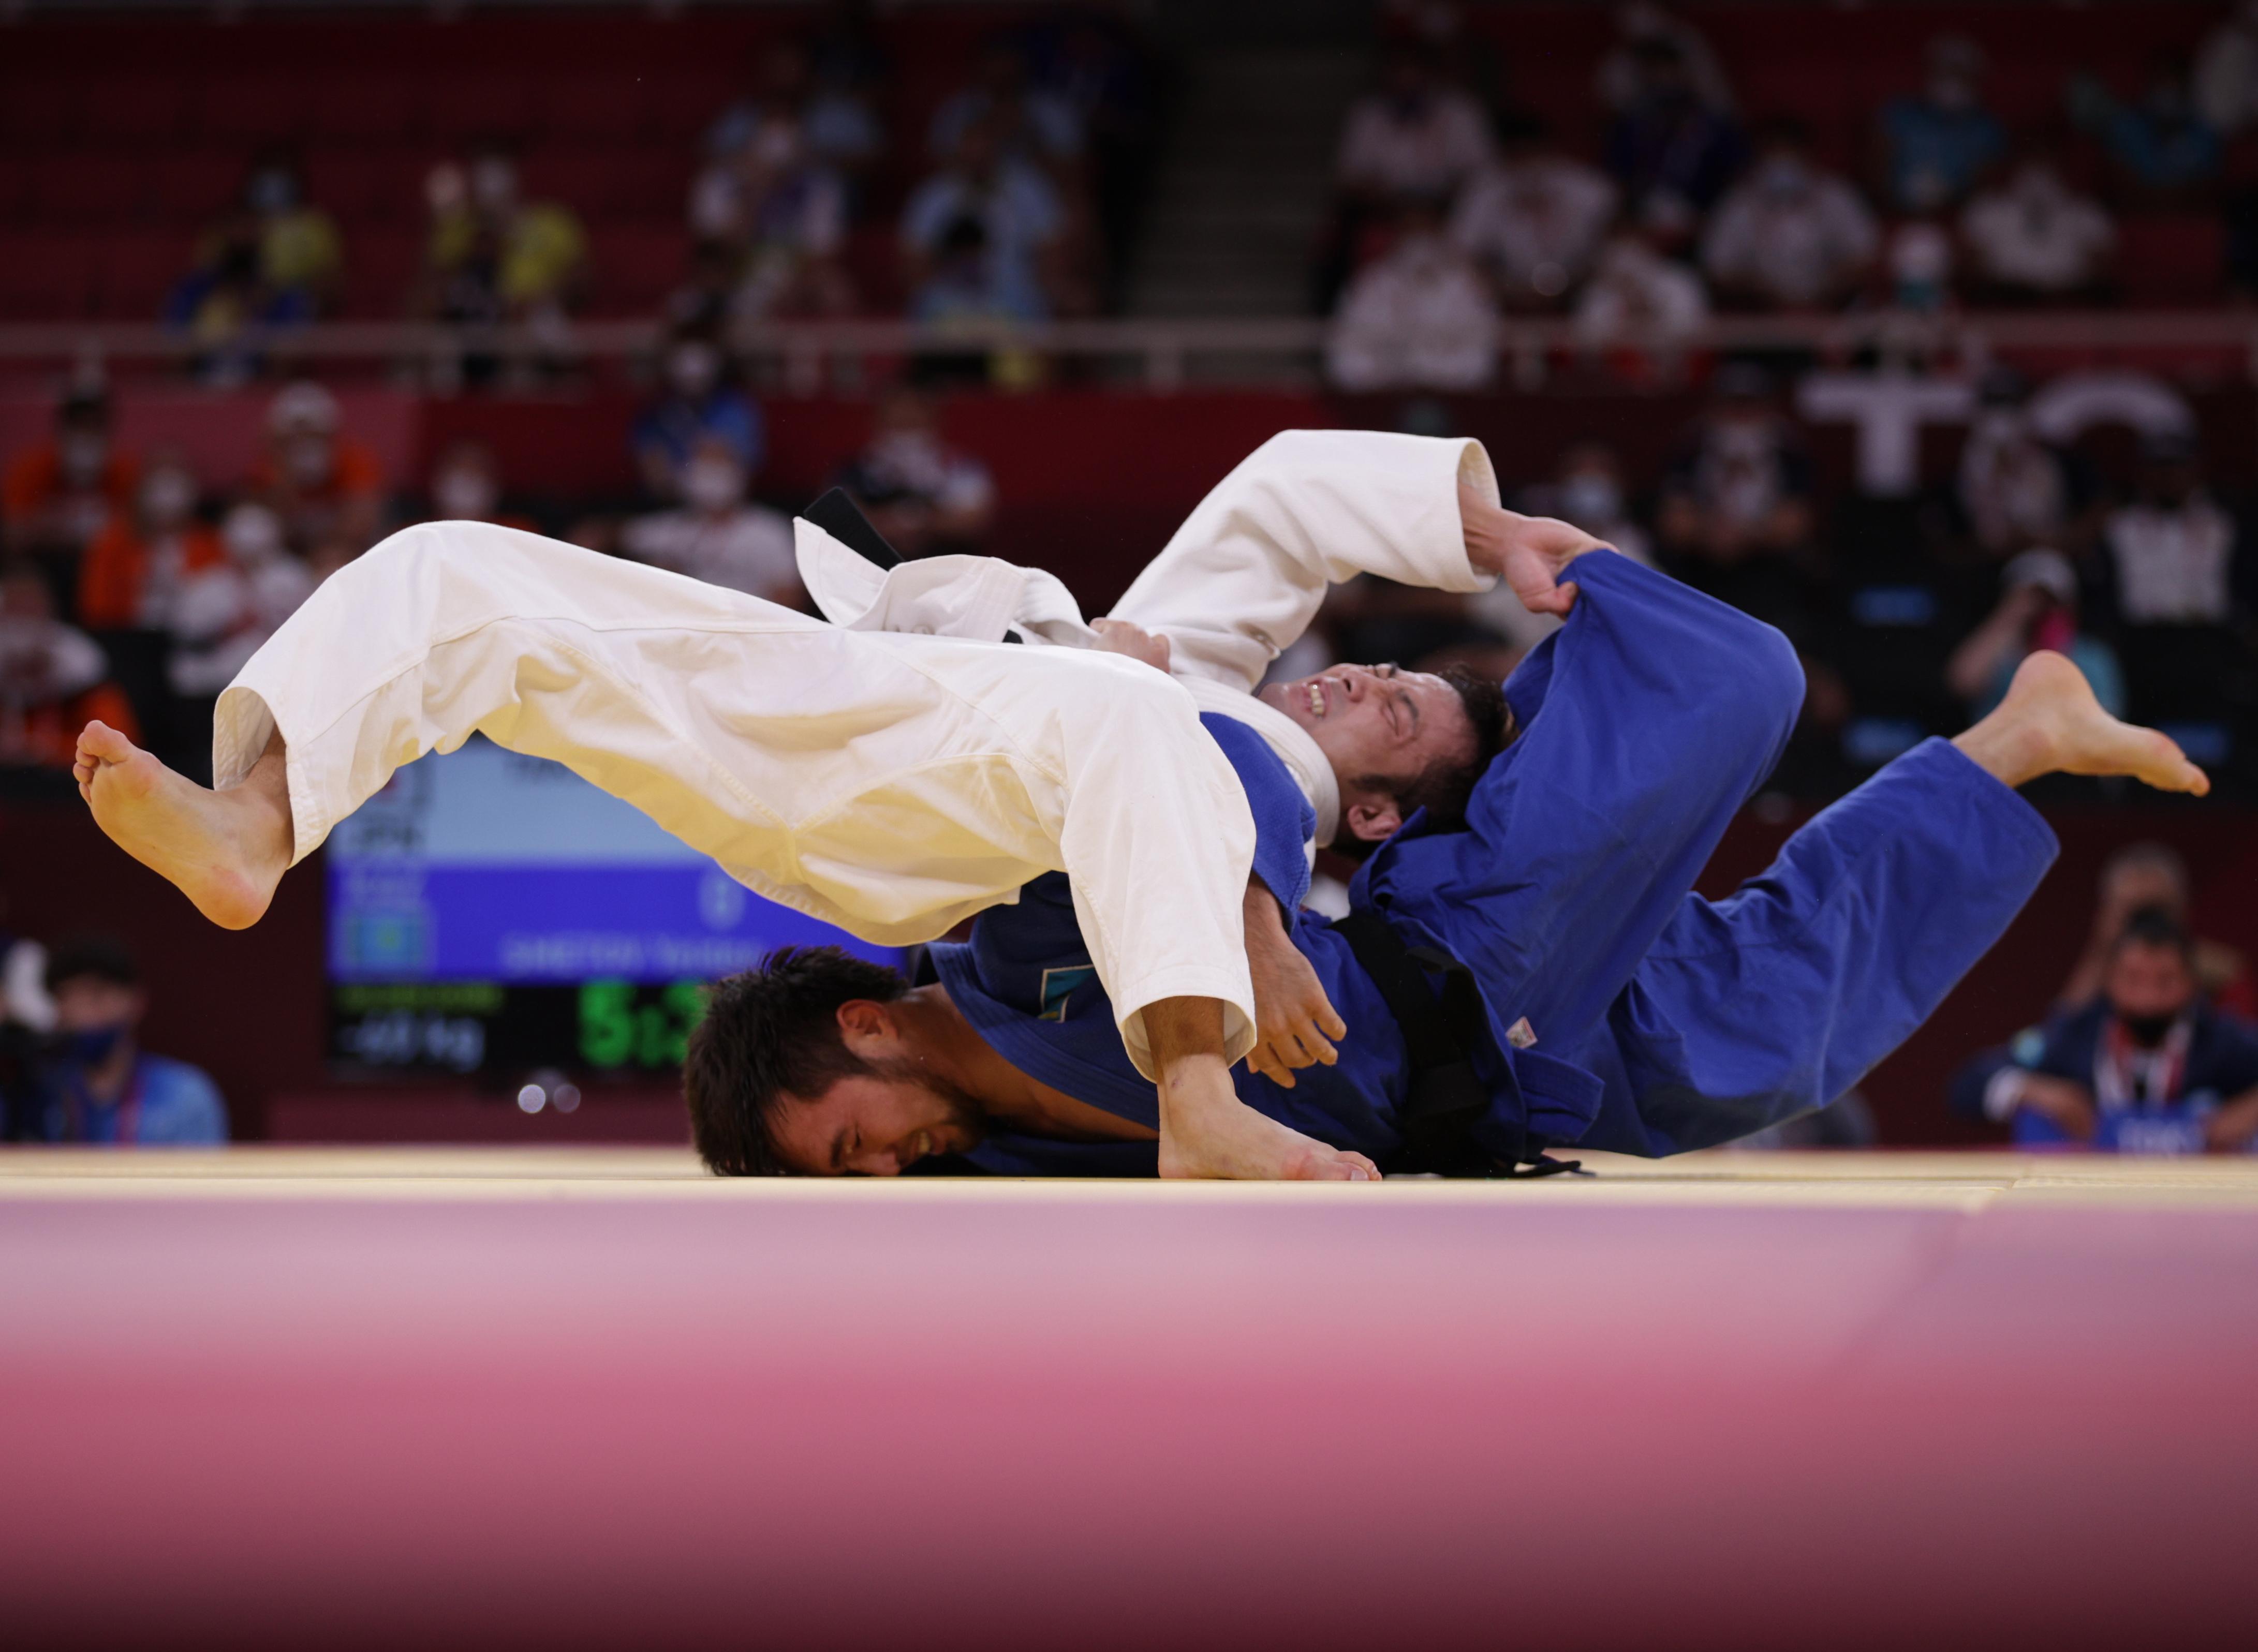 Tokyo 2020 Olympics - Judo - Men's 60kg - Semifinal - Nippon Budokan - Tokyo, Japan - July 24, 2021. Naohisa Takato of Japan in action against Yeldos Smetov of Kazakhstan REUTERS/Hannah Mckay